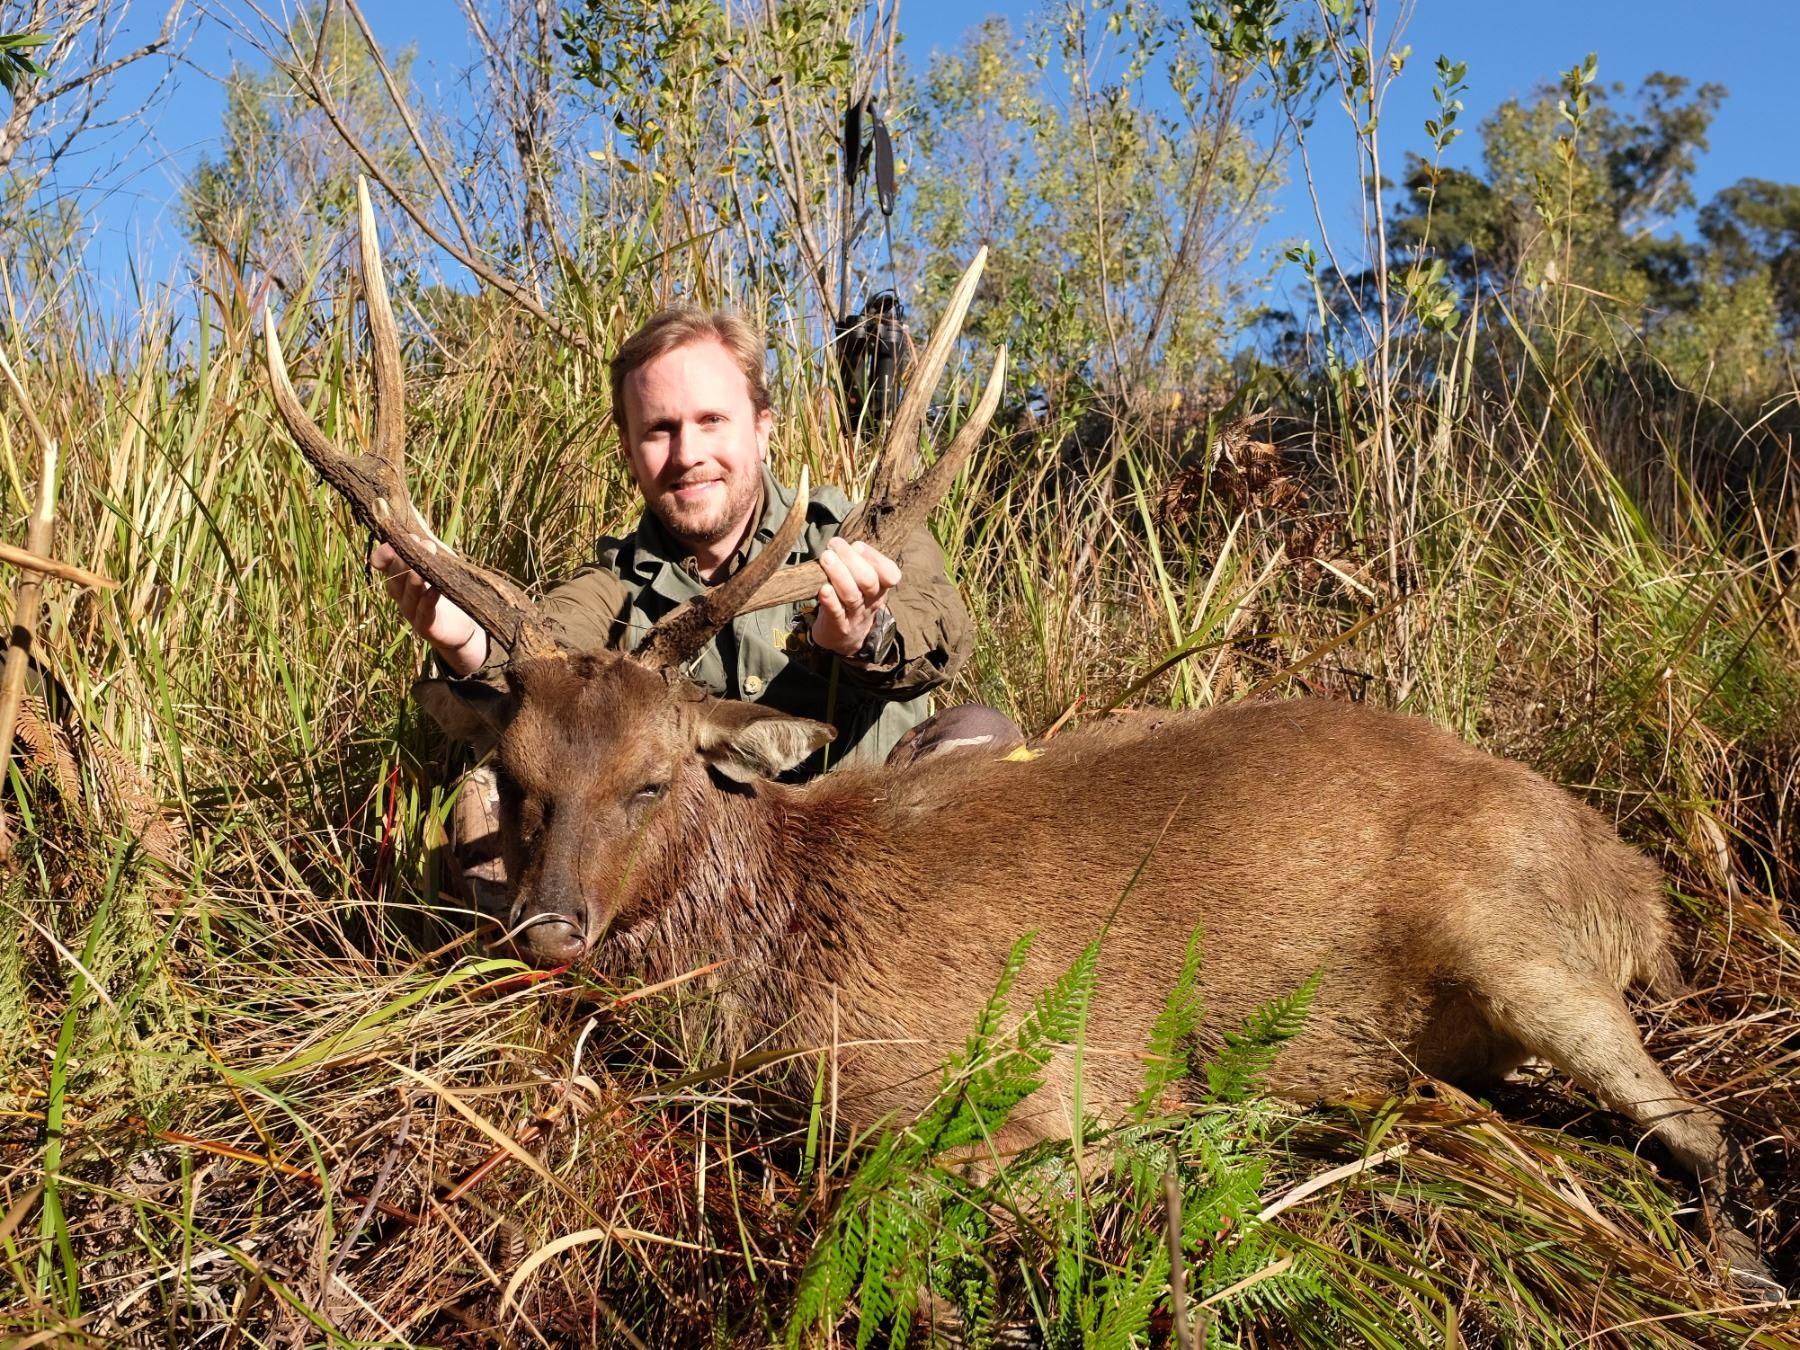 KINGHAM SAFARIS AUSTRALIA: 3-Day Moluccan Rusa Hunt for One Hunter in Australia - Includes Trophy Fe